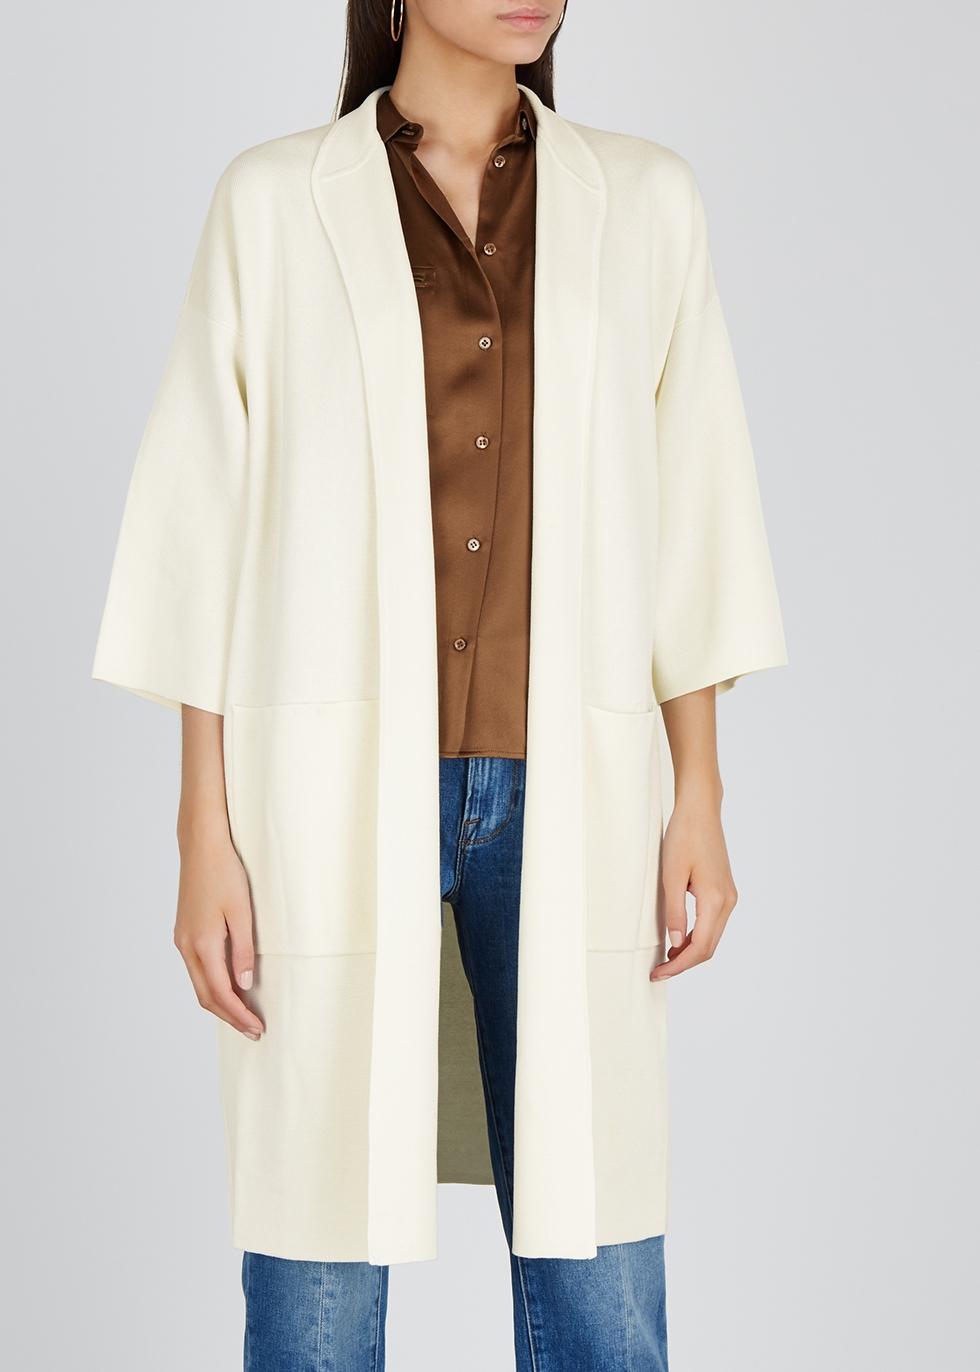 Cream knitted silk-blend cardigan - EILEEN FISHER